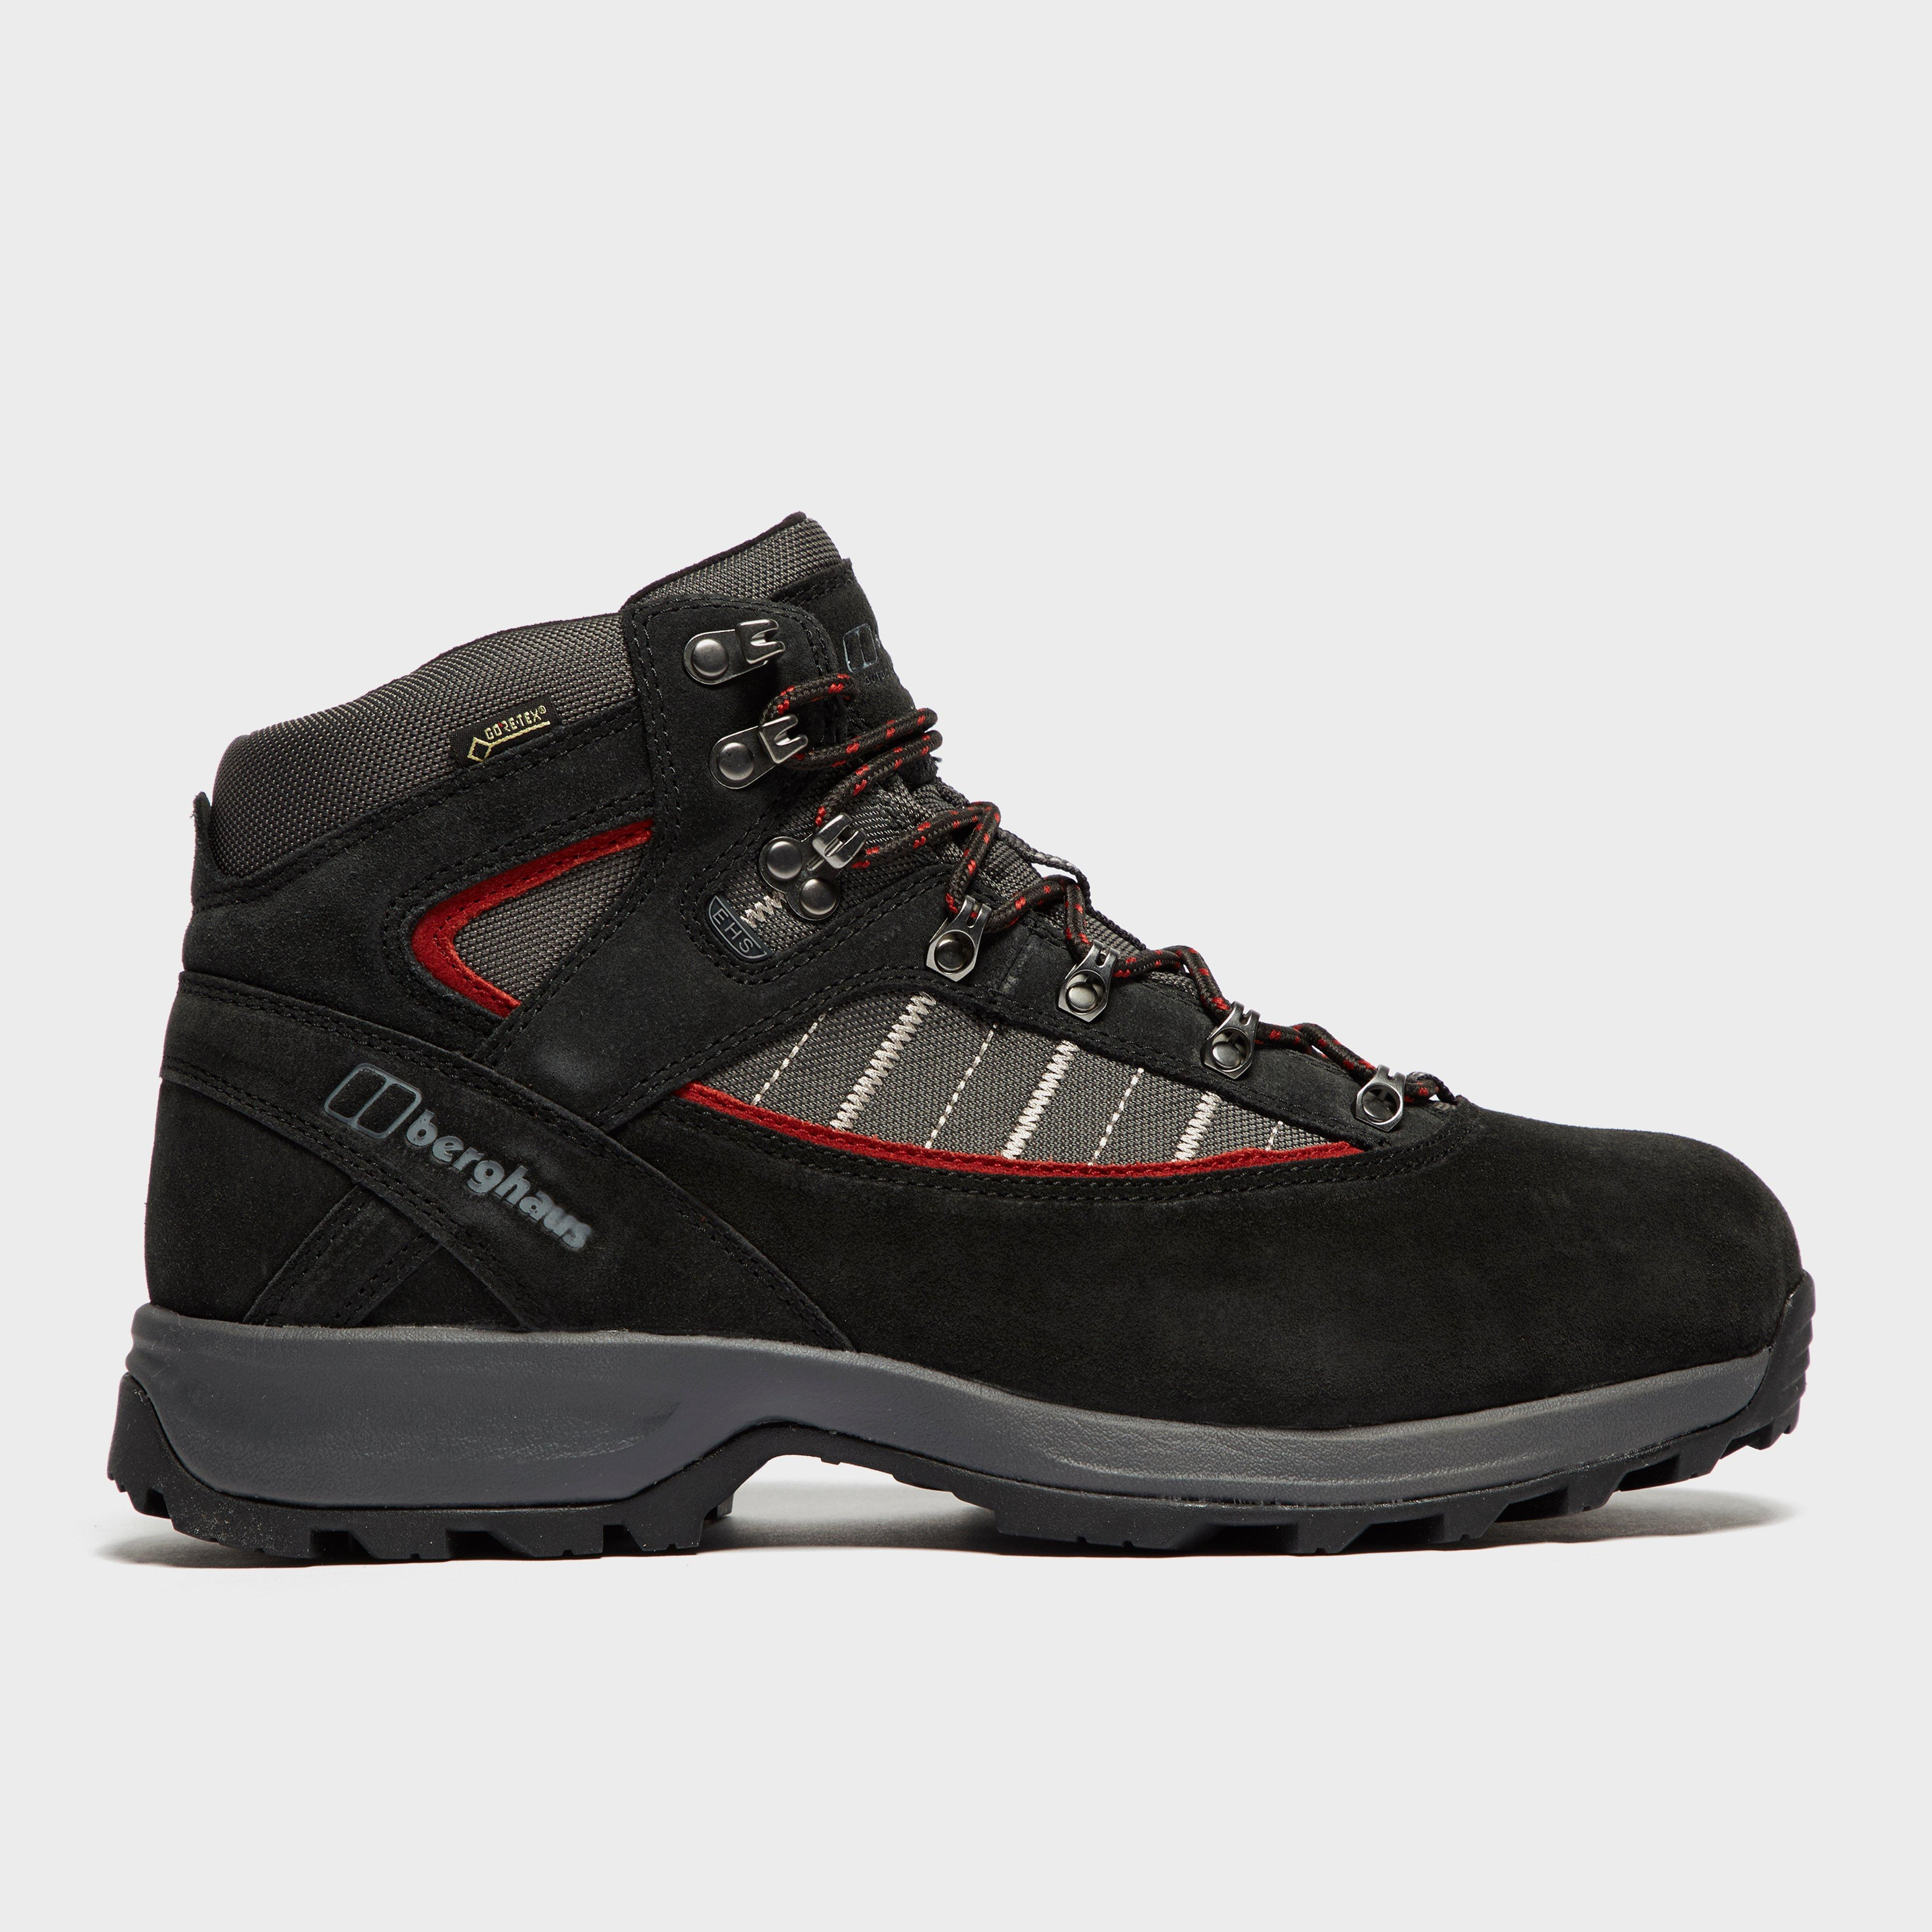 368132ebd69 Details about New Berghaus Men's Explorer Trek GORE-TEX® Walking Boots